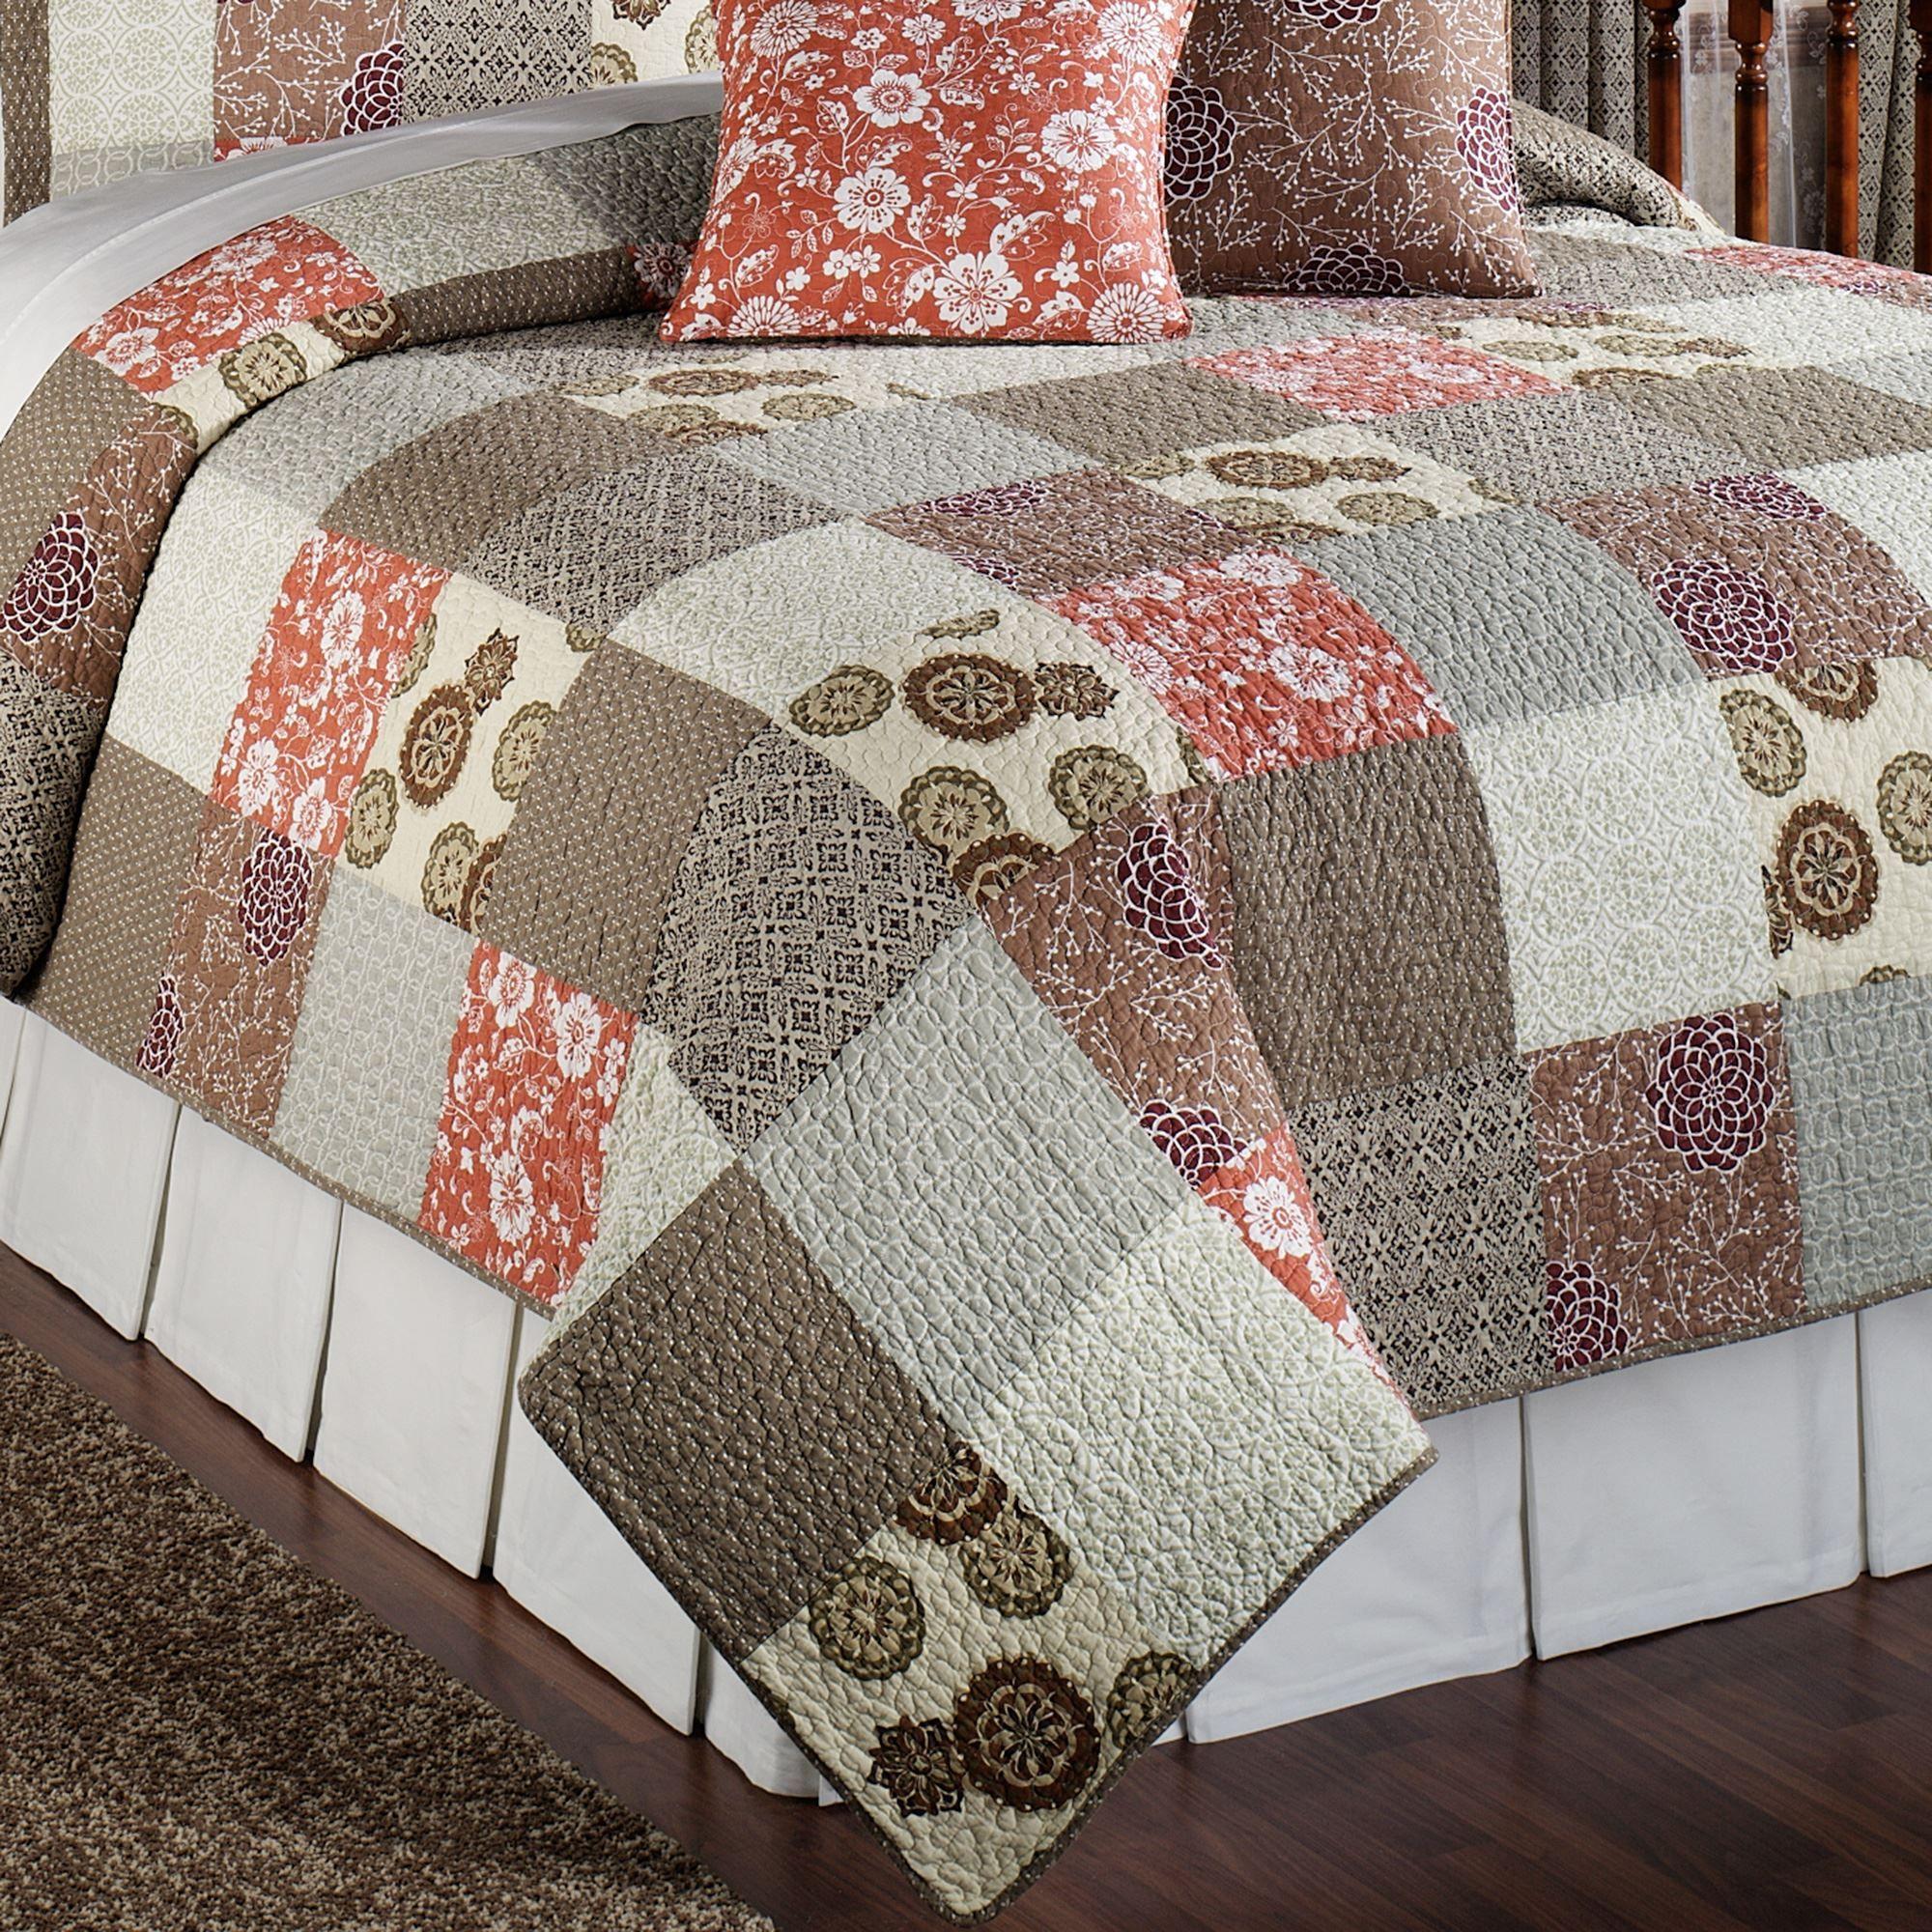 Stella Cotton Patchwork Quilt Bed Set : the patchwork quilt summary - Adamdwight.com